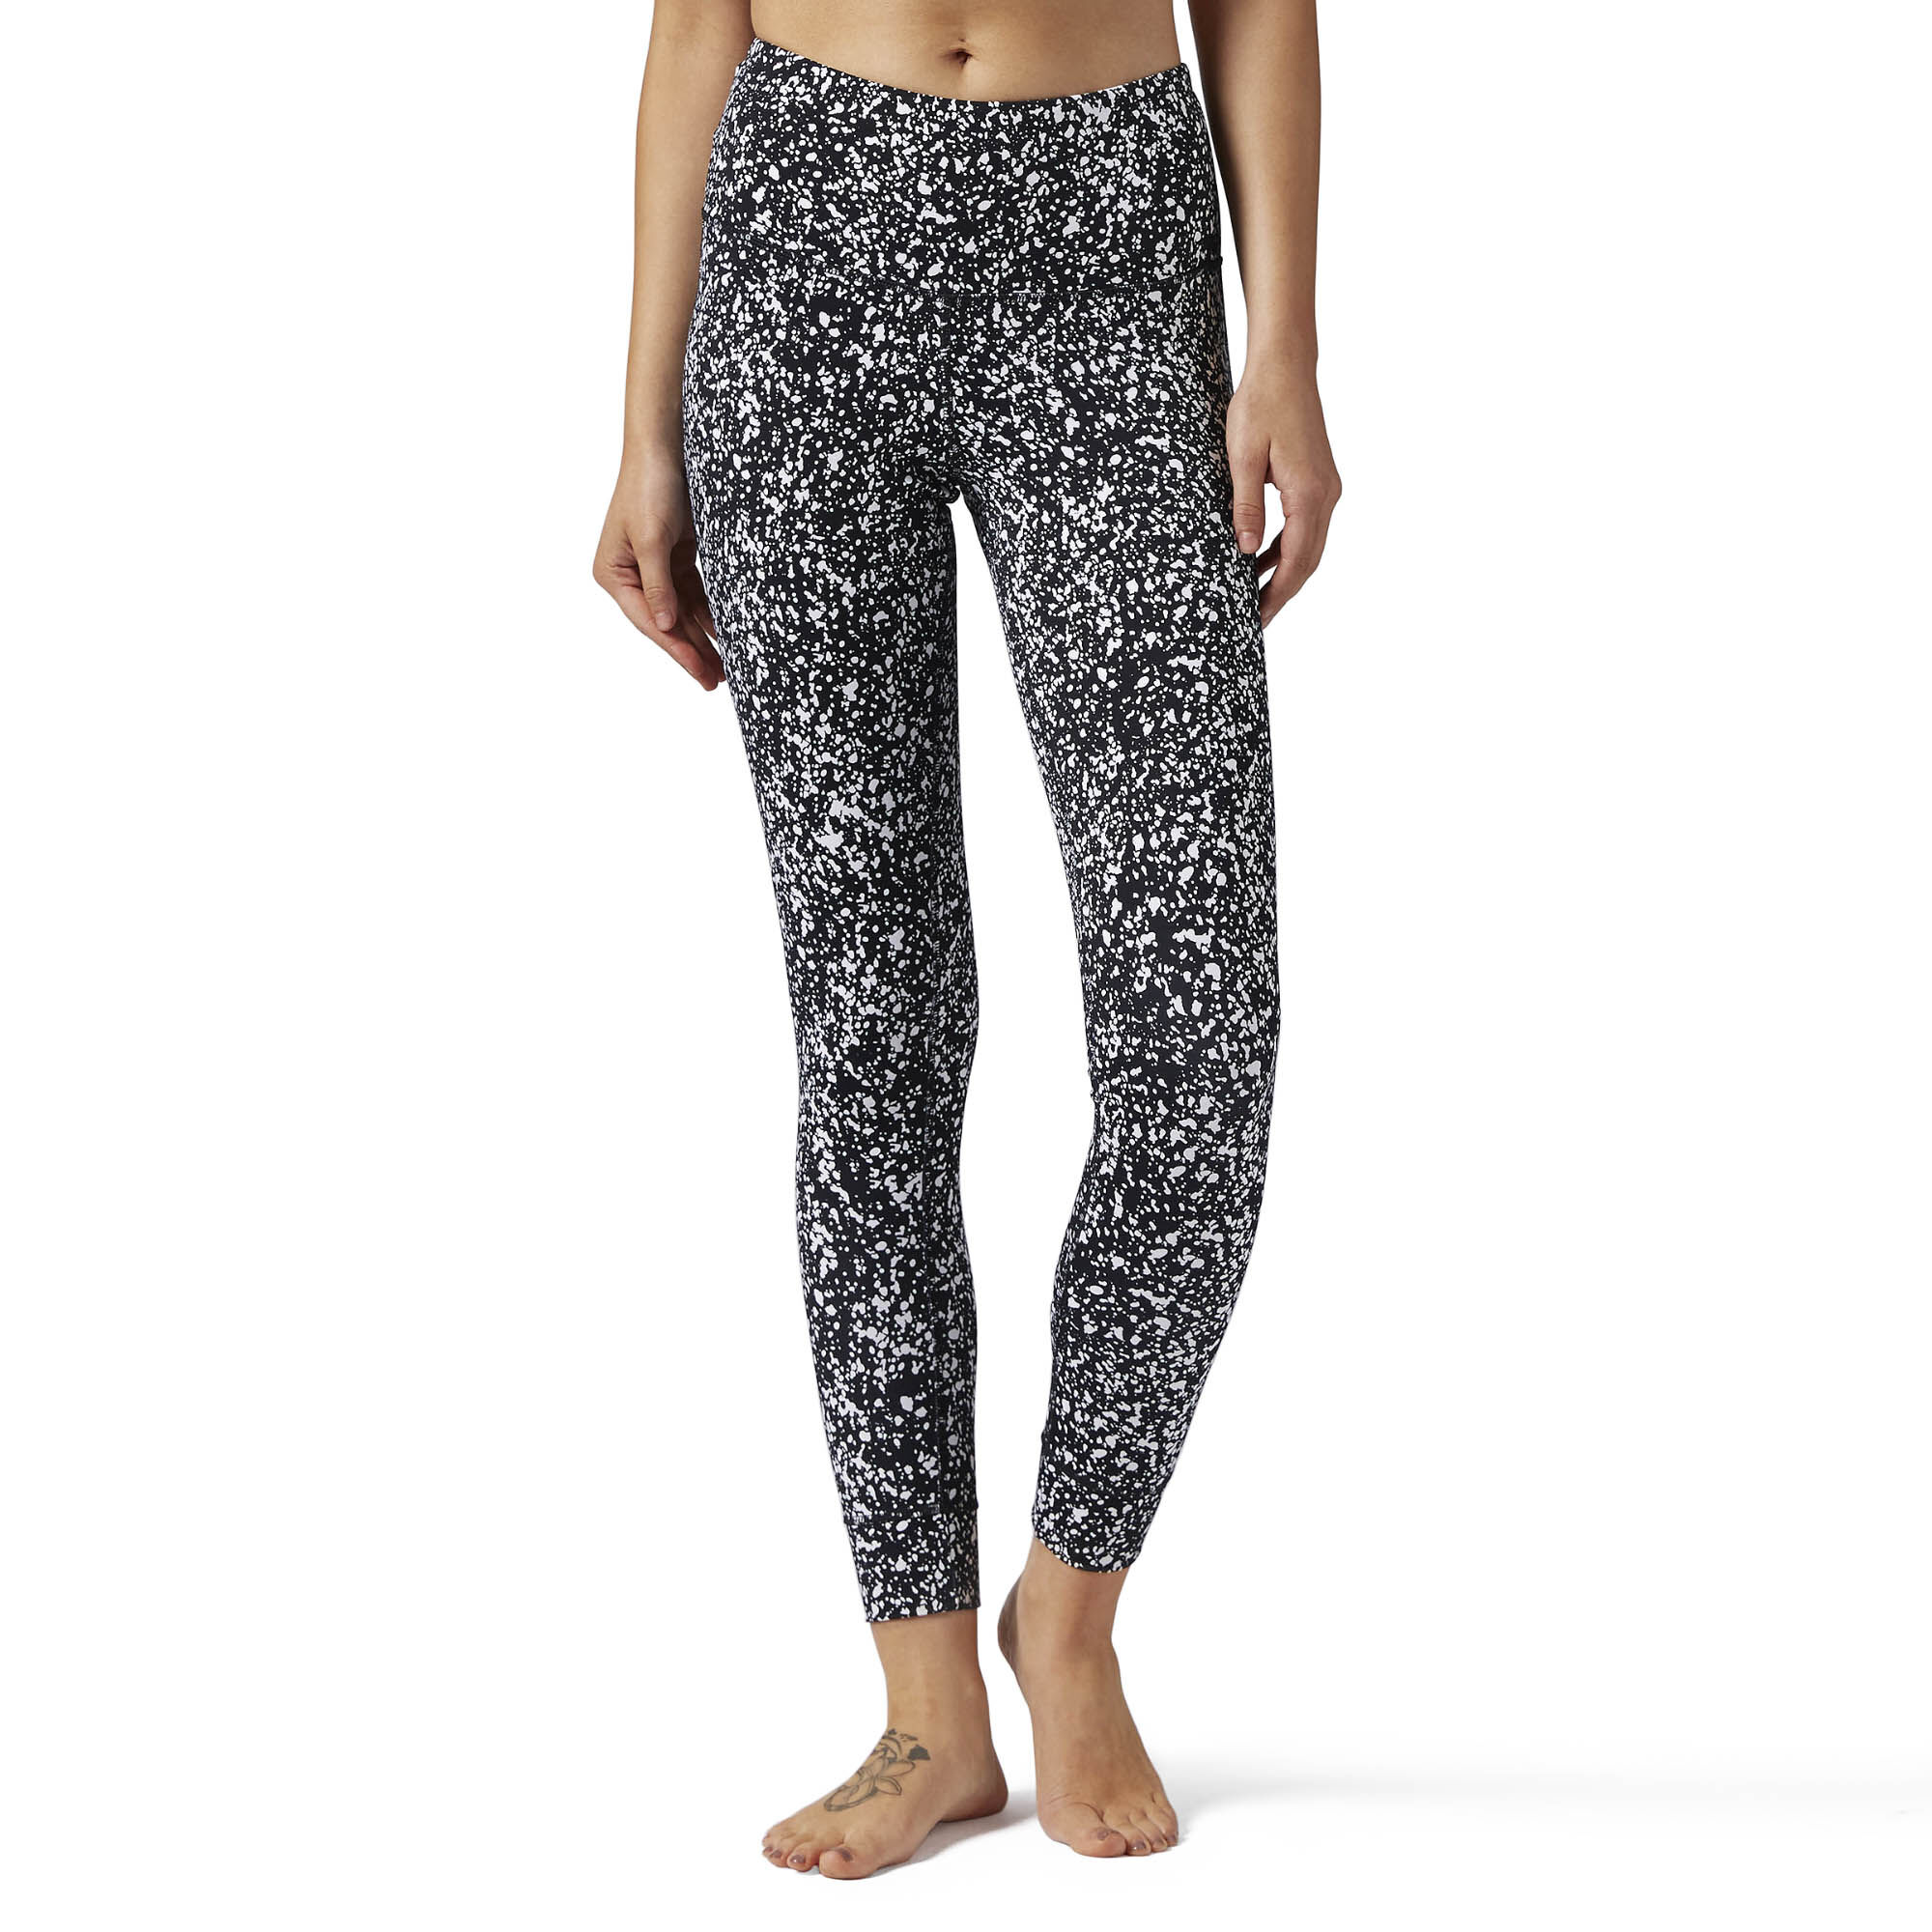 Reebok - High Rise Lux Bold Legging - Speckle Print Black BQ8179